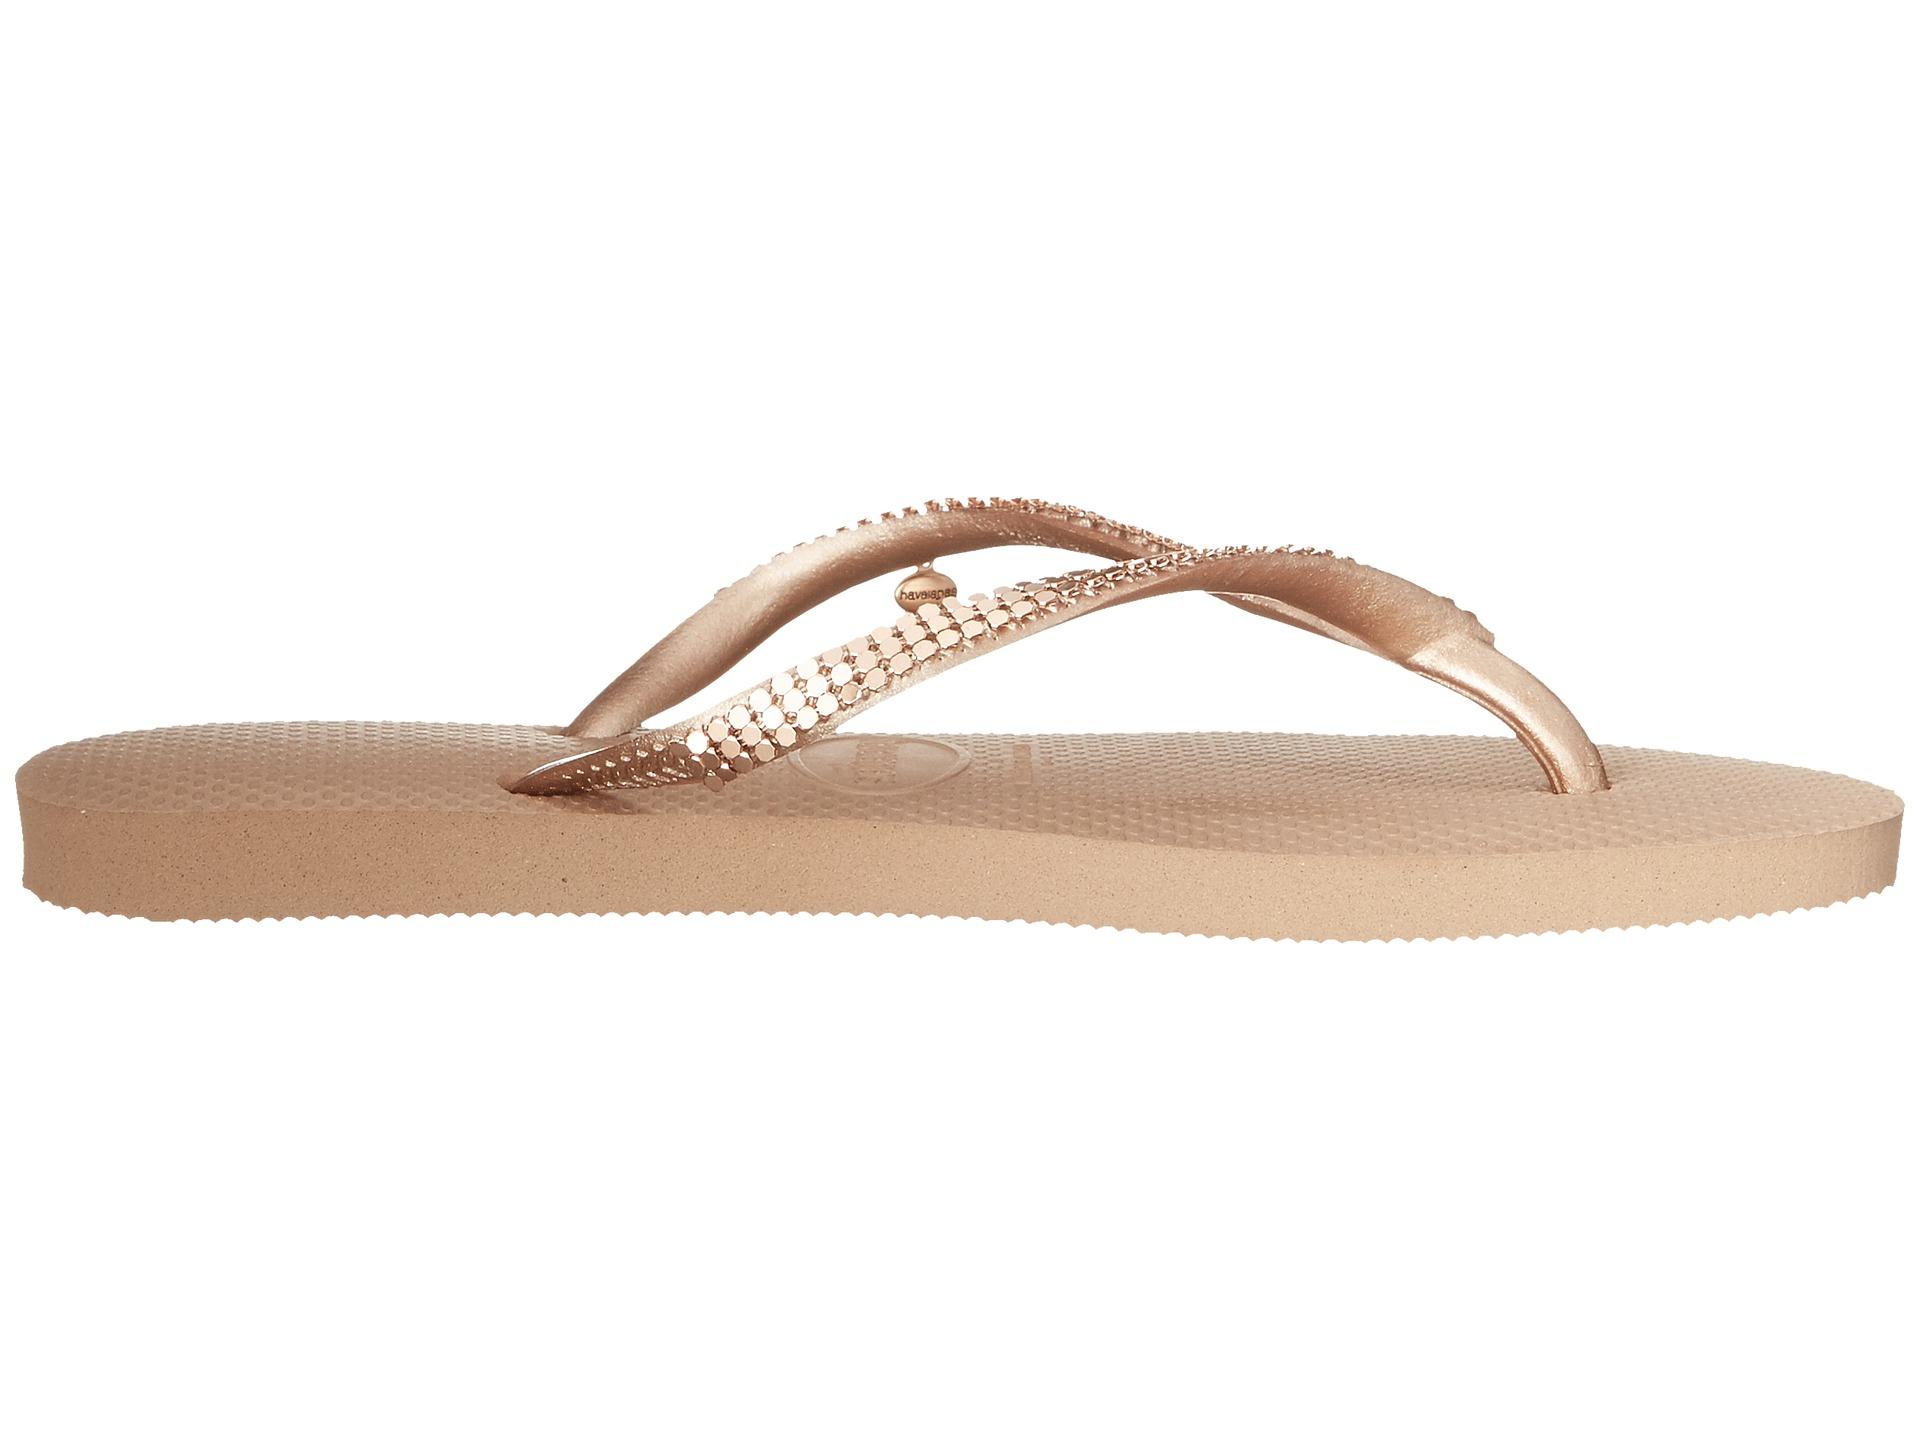 08b83d221049 Lyst - Havaianas Slim Metal Mesh Flip Flops in Natural